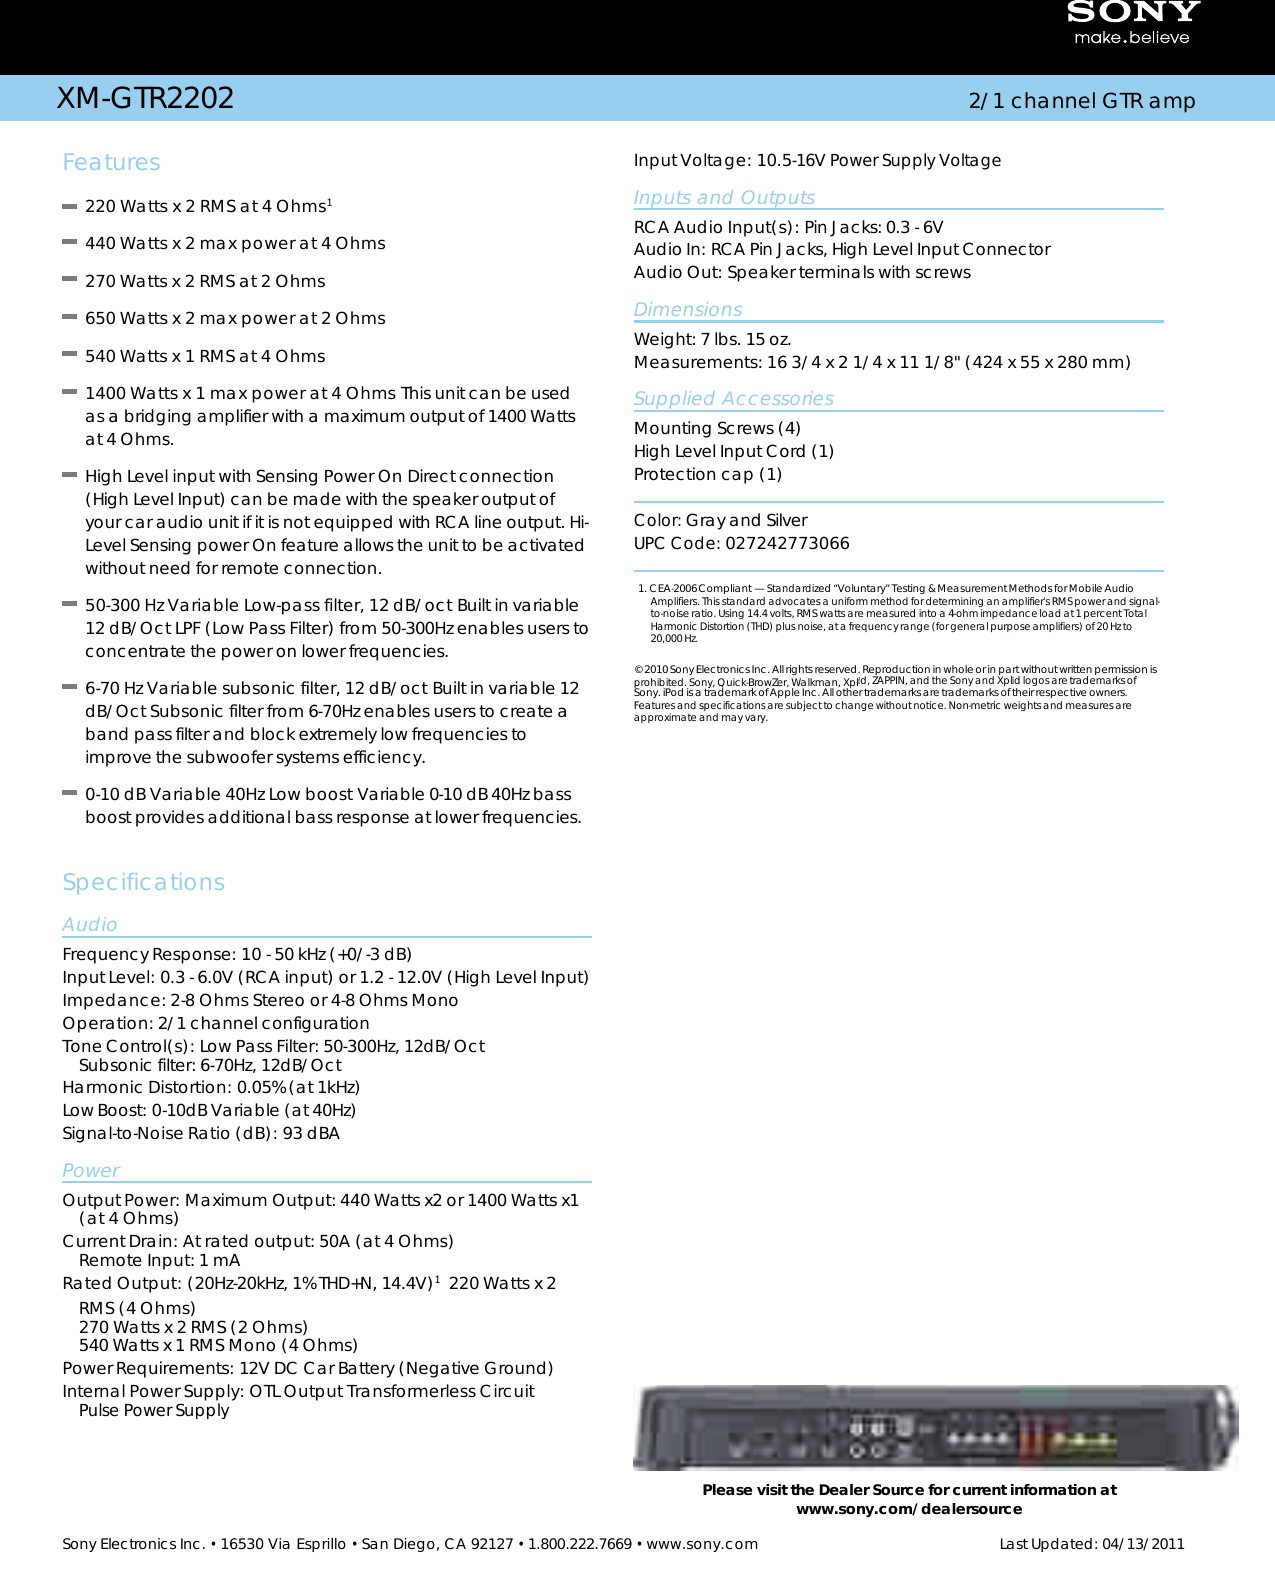 Sony XM GTR2202 User Manual Marketing Specifications